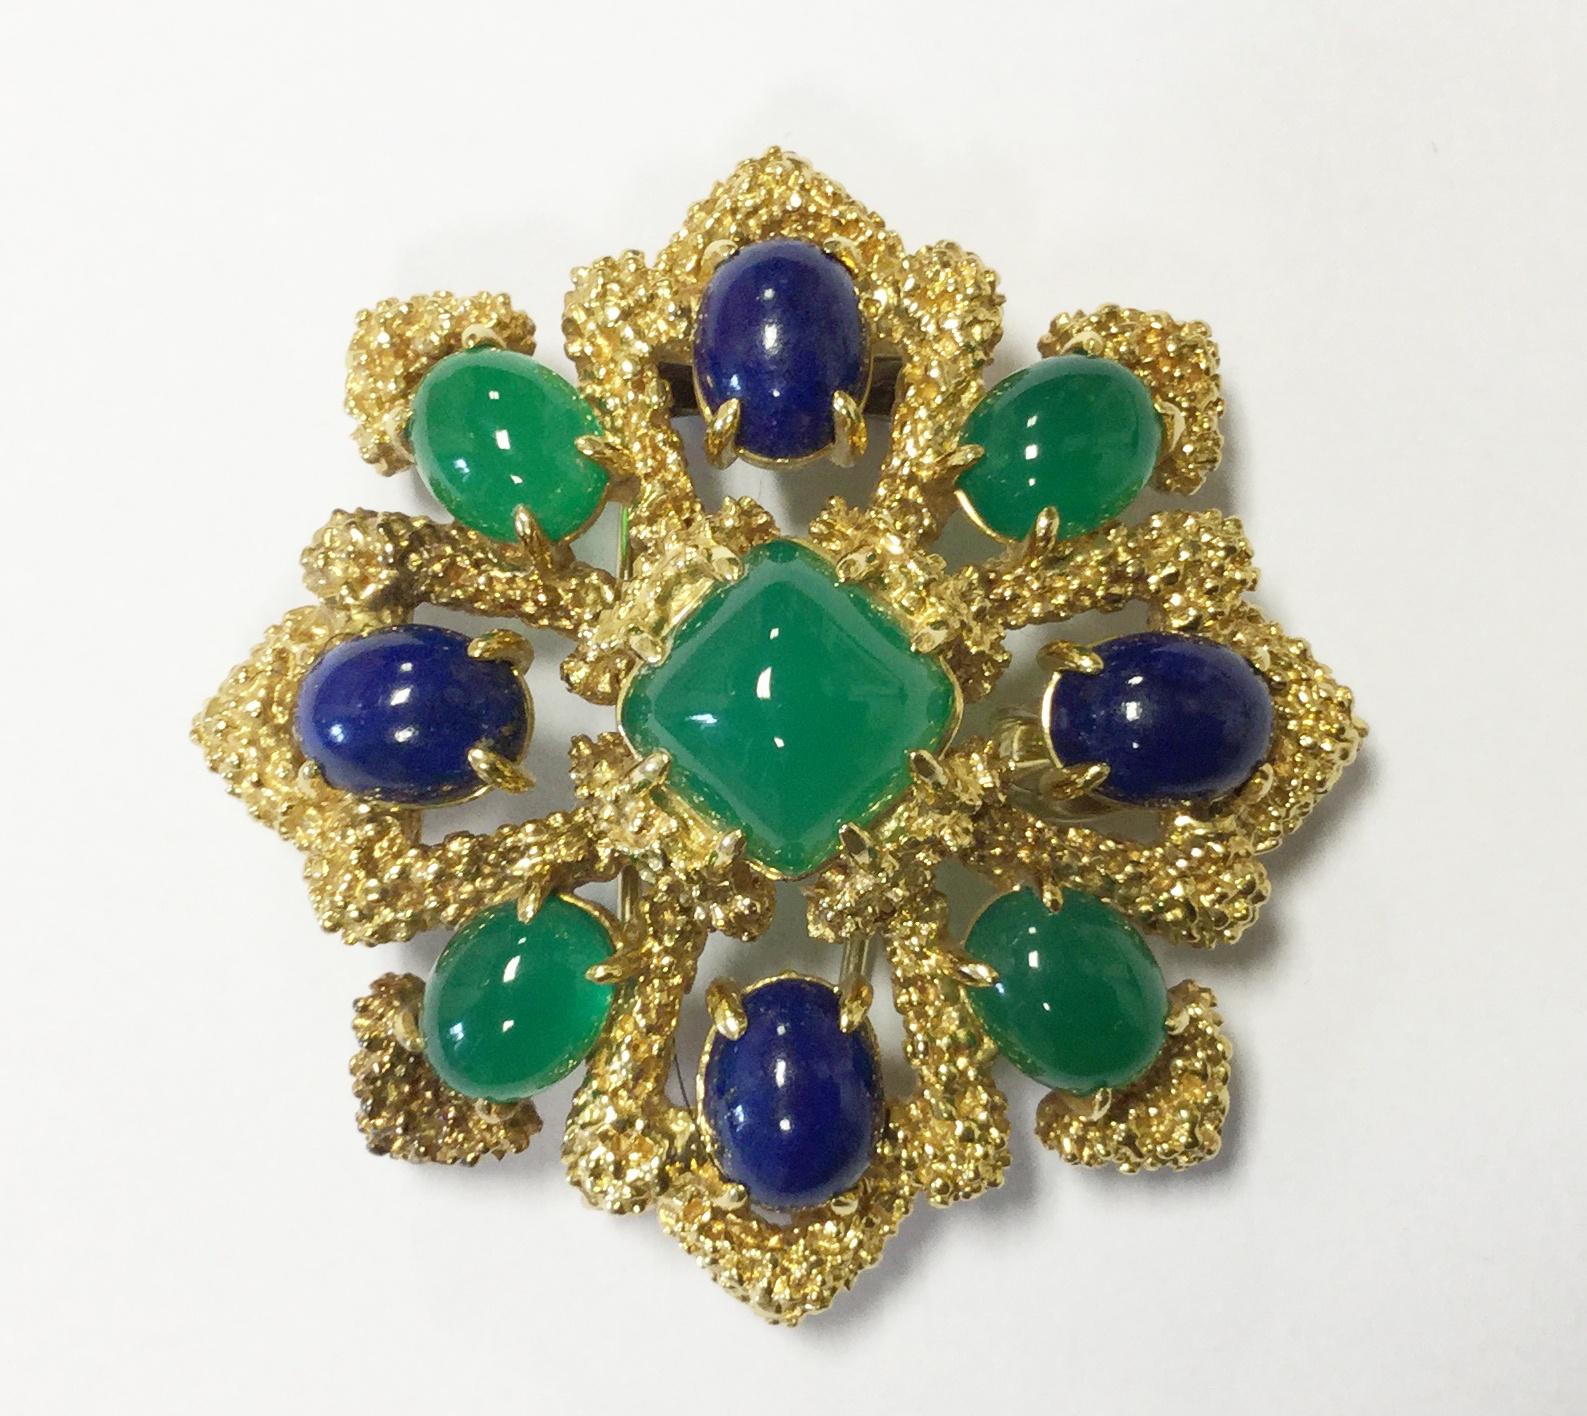 Broche Van Cleef & Arpels chrysoprase et lapis lazuli.